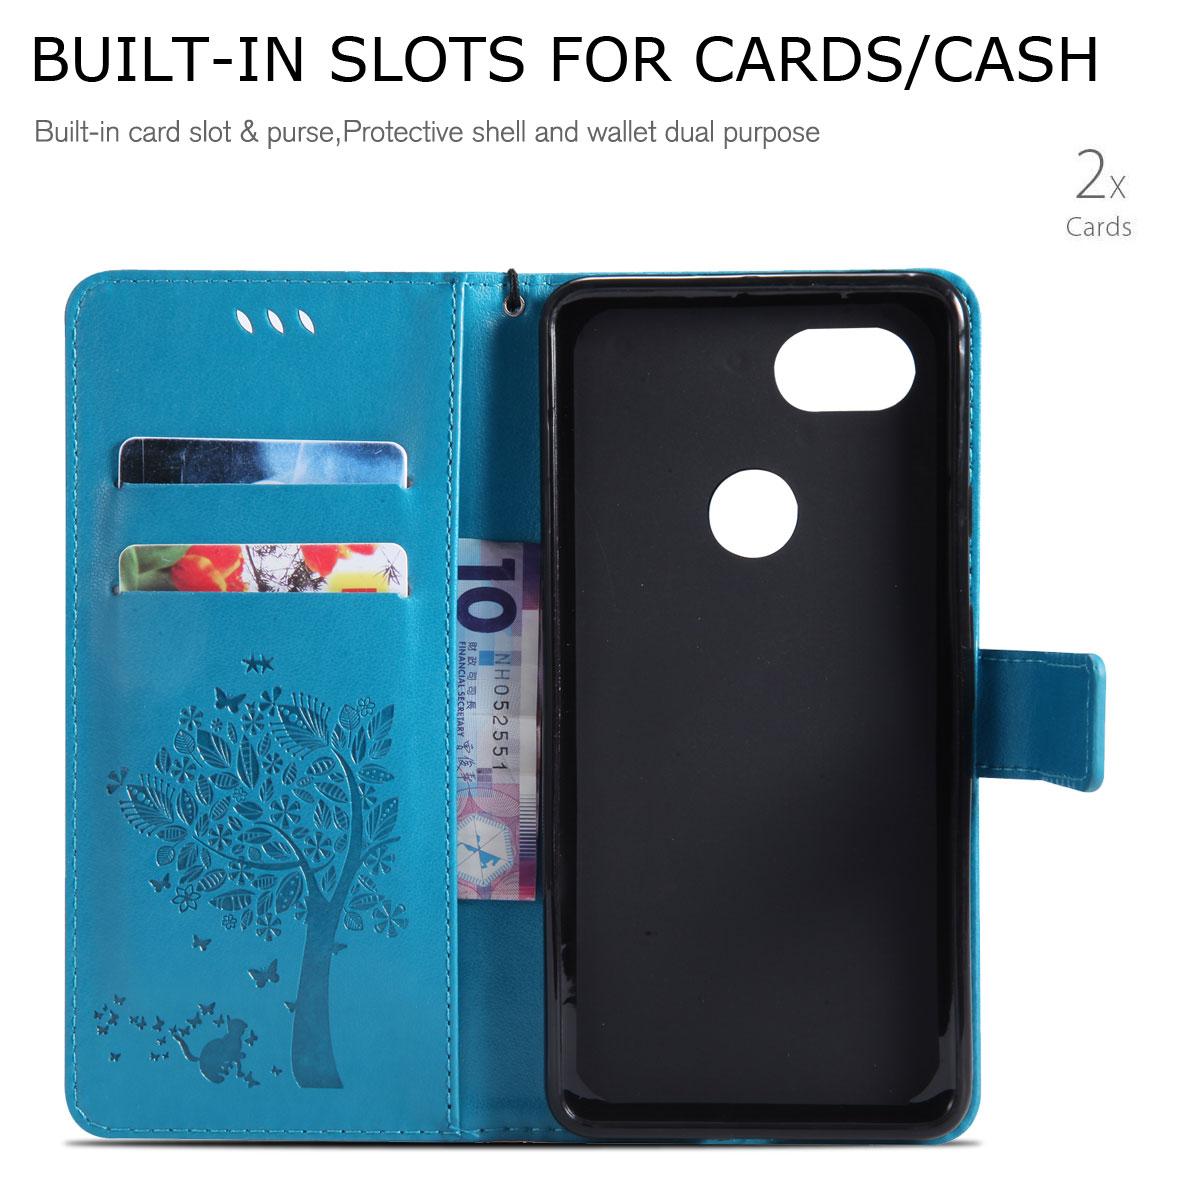 Magnetic-Leather-Credit-Card-Holder-Flip-Case-Cover-For-Google-Pixel-2-2-XL thumbnail 20